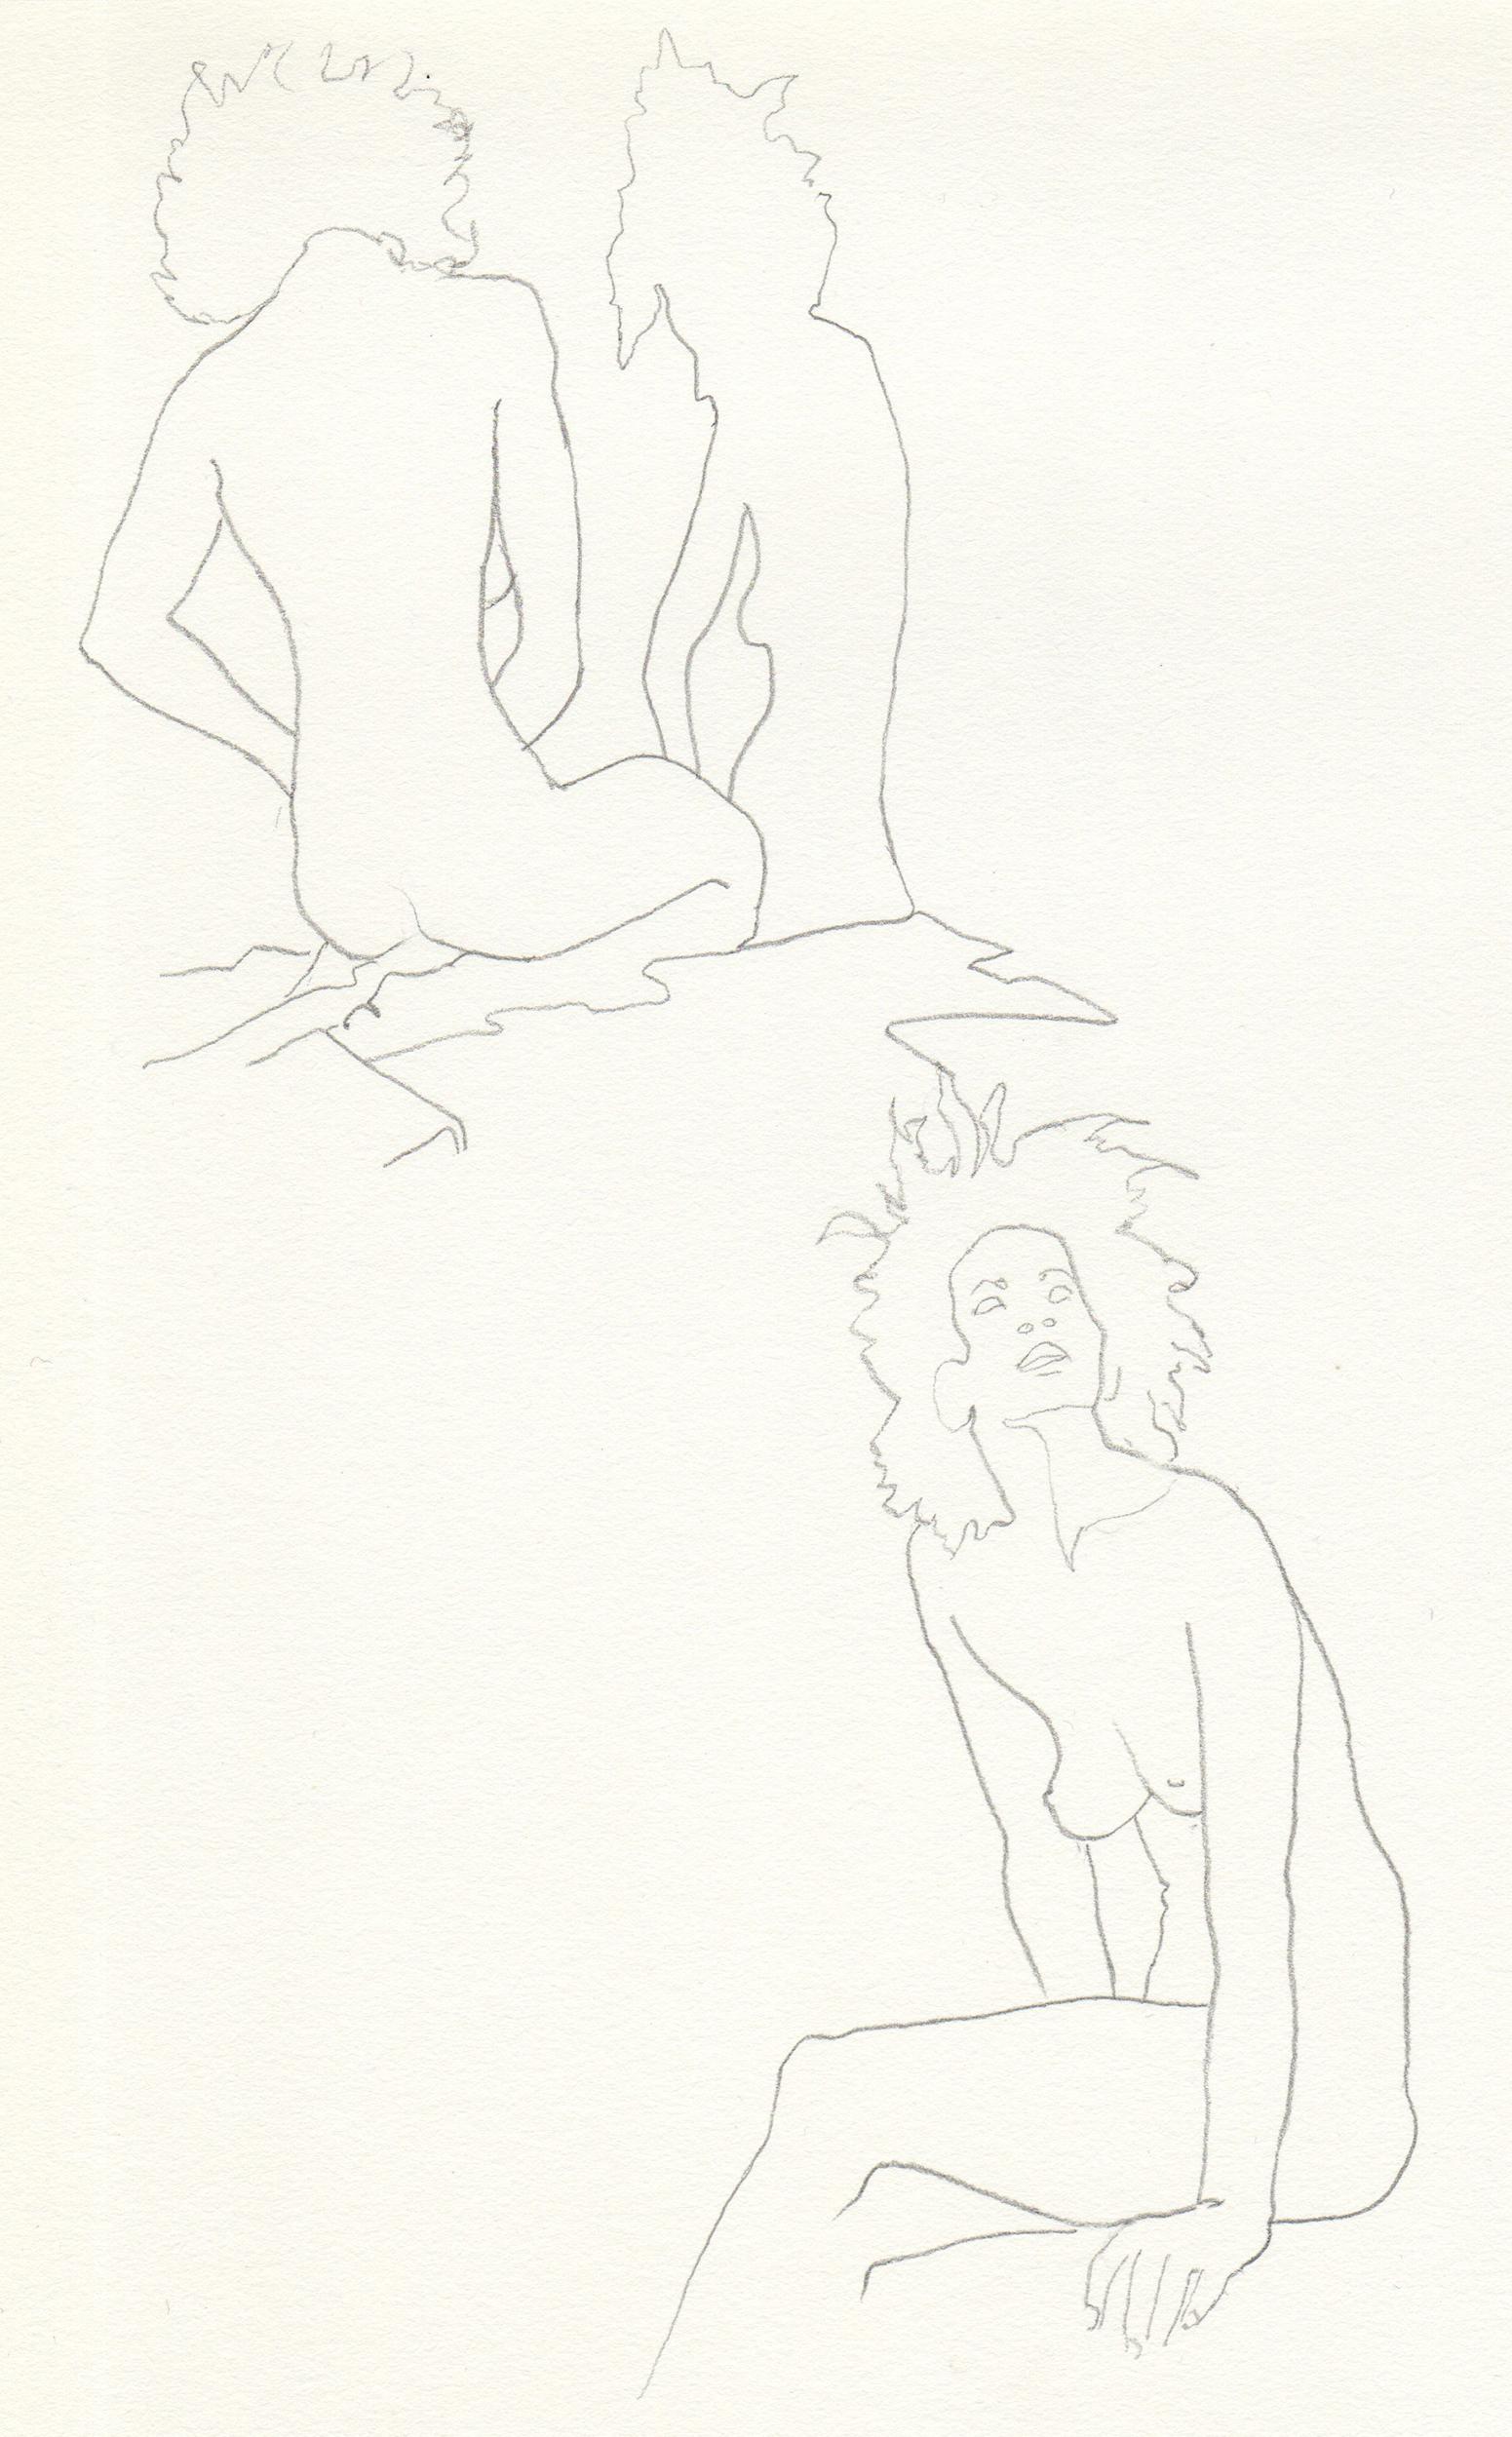 2012_Sketch_F-Beudin_049